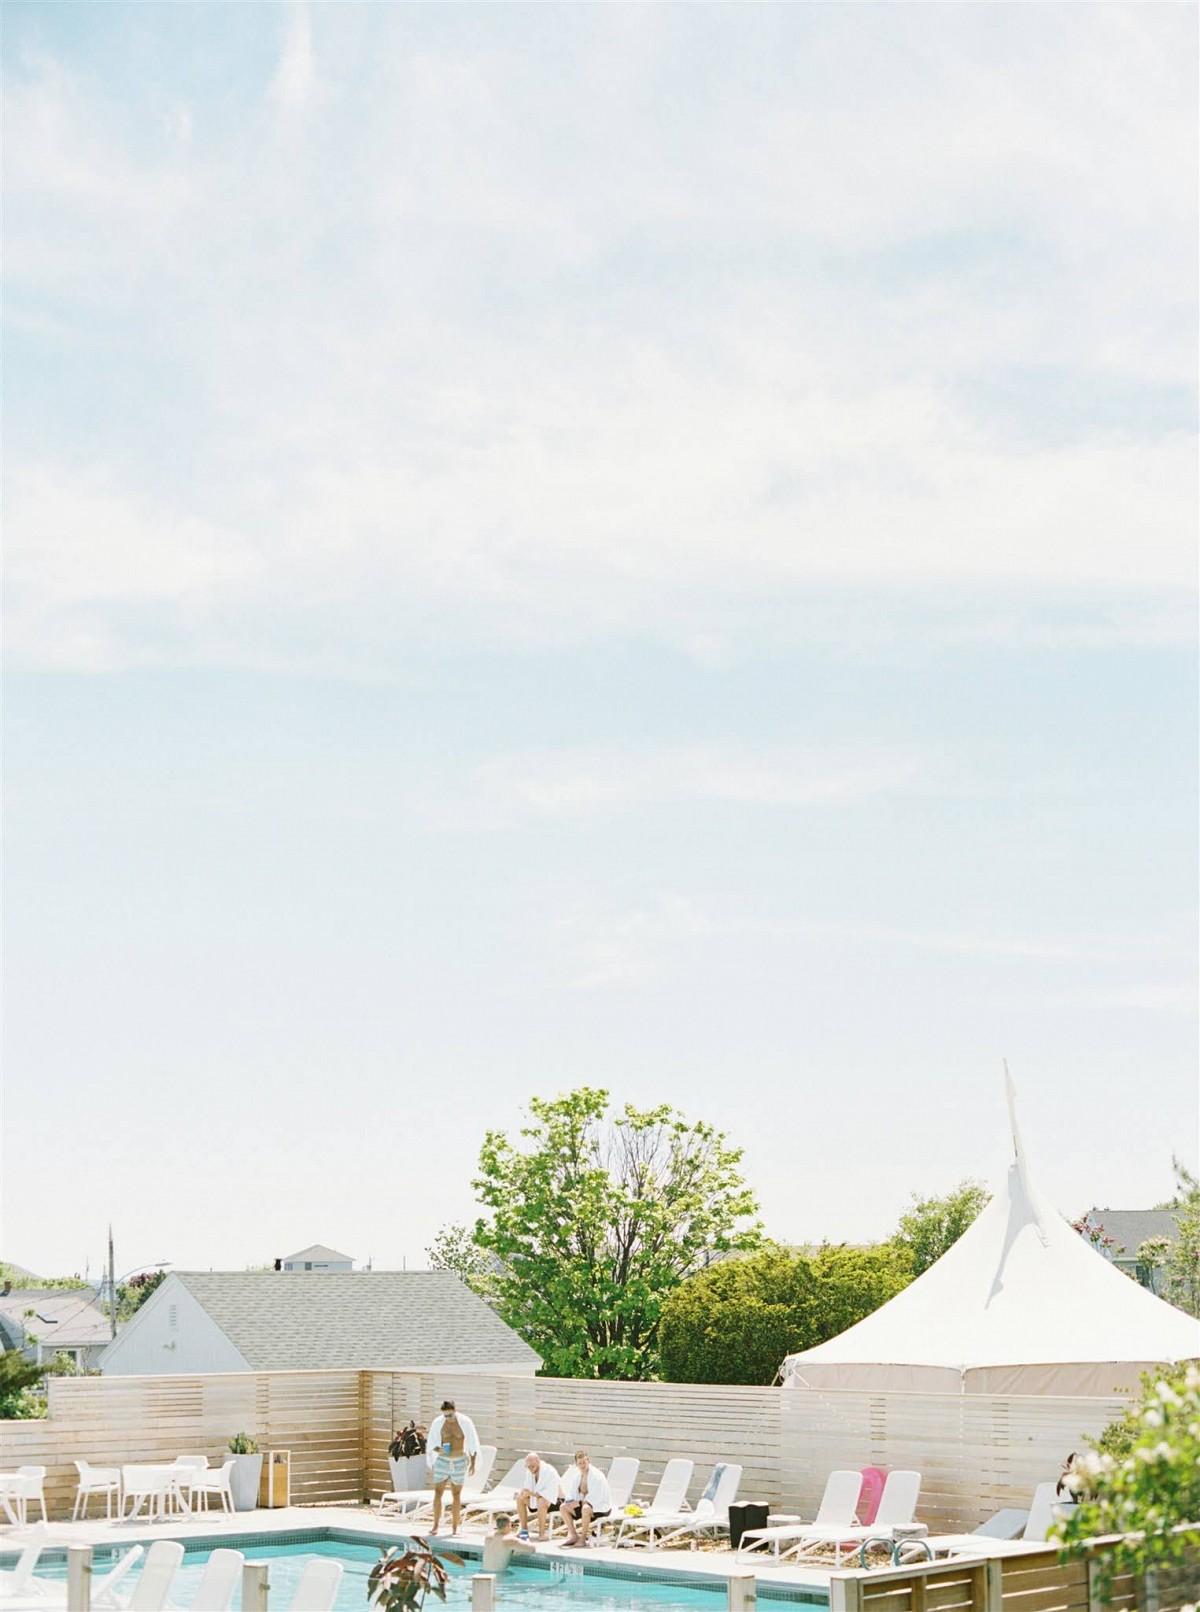 Destination wedding in pool location by Elizabeth Laduca